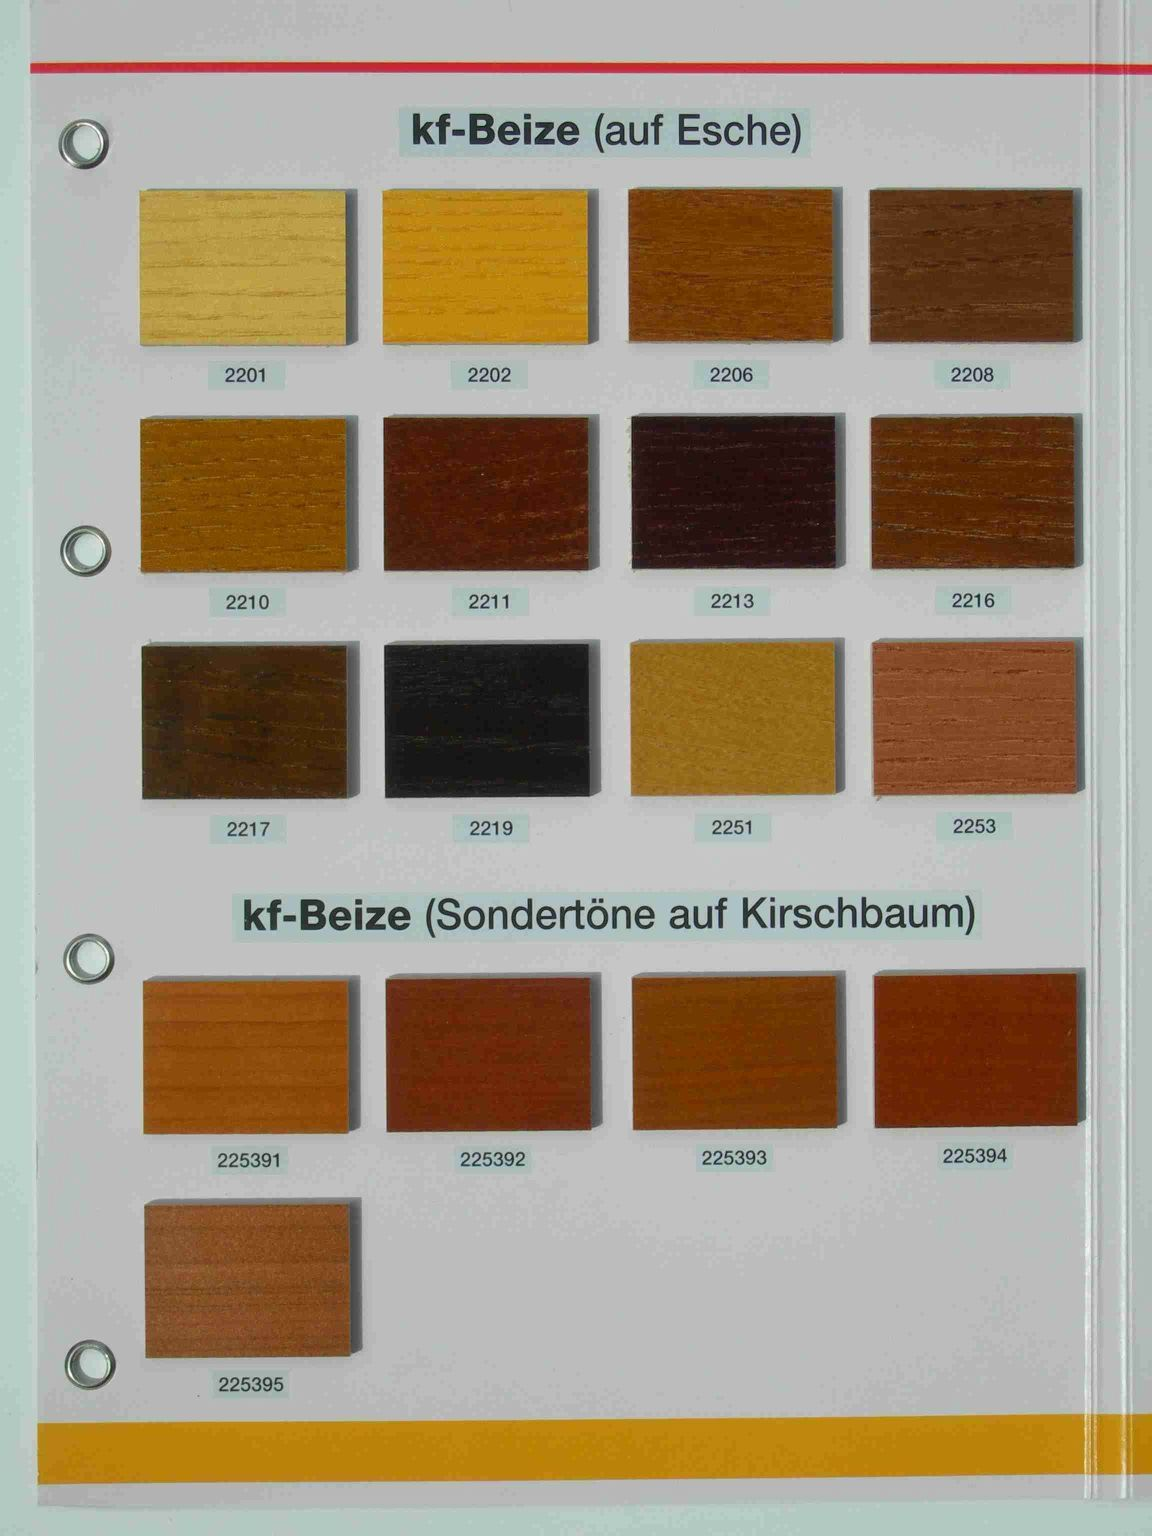 povrchová úprava dreva   clou kf-beize 1 liter  